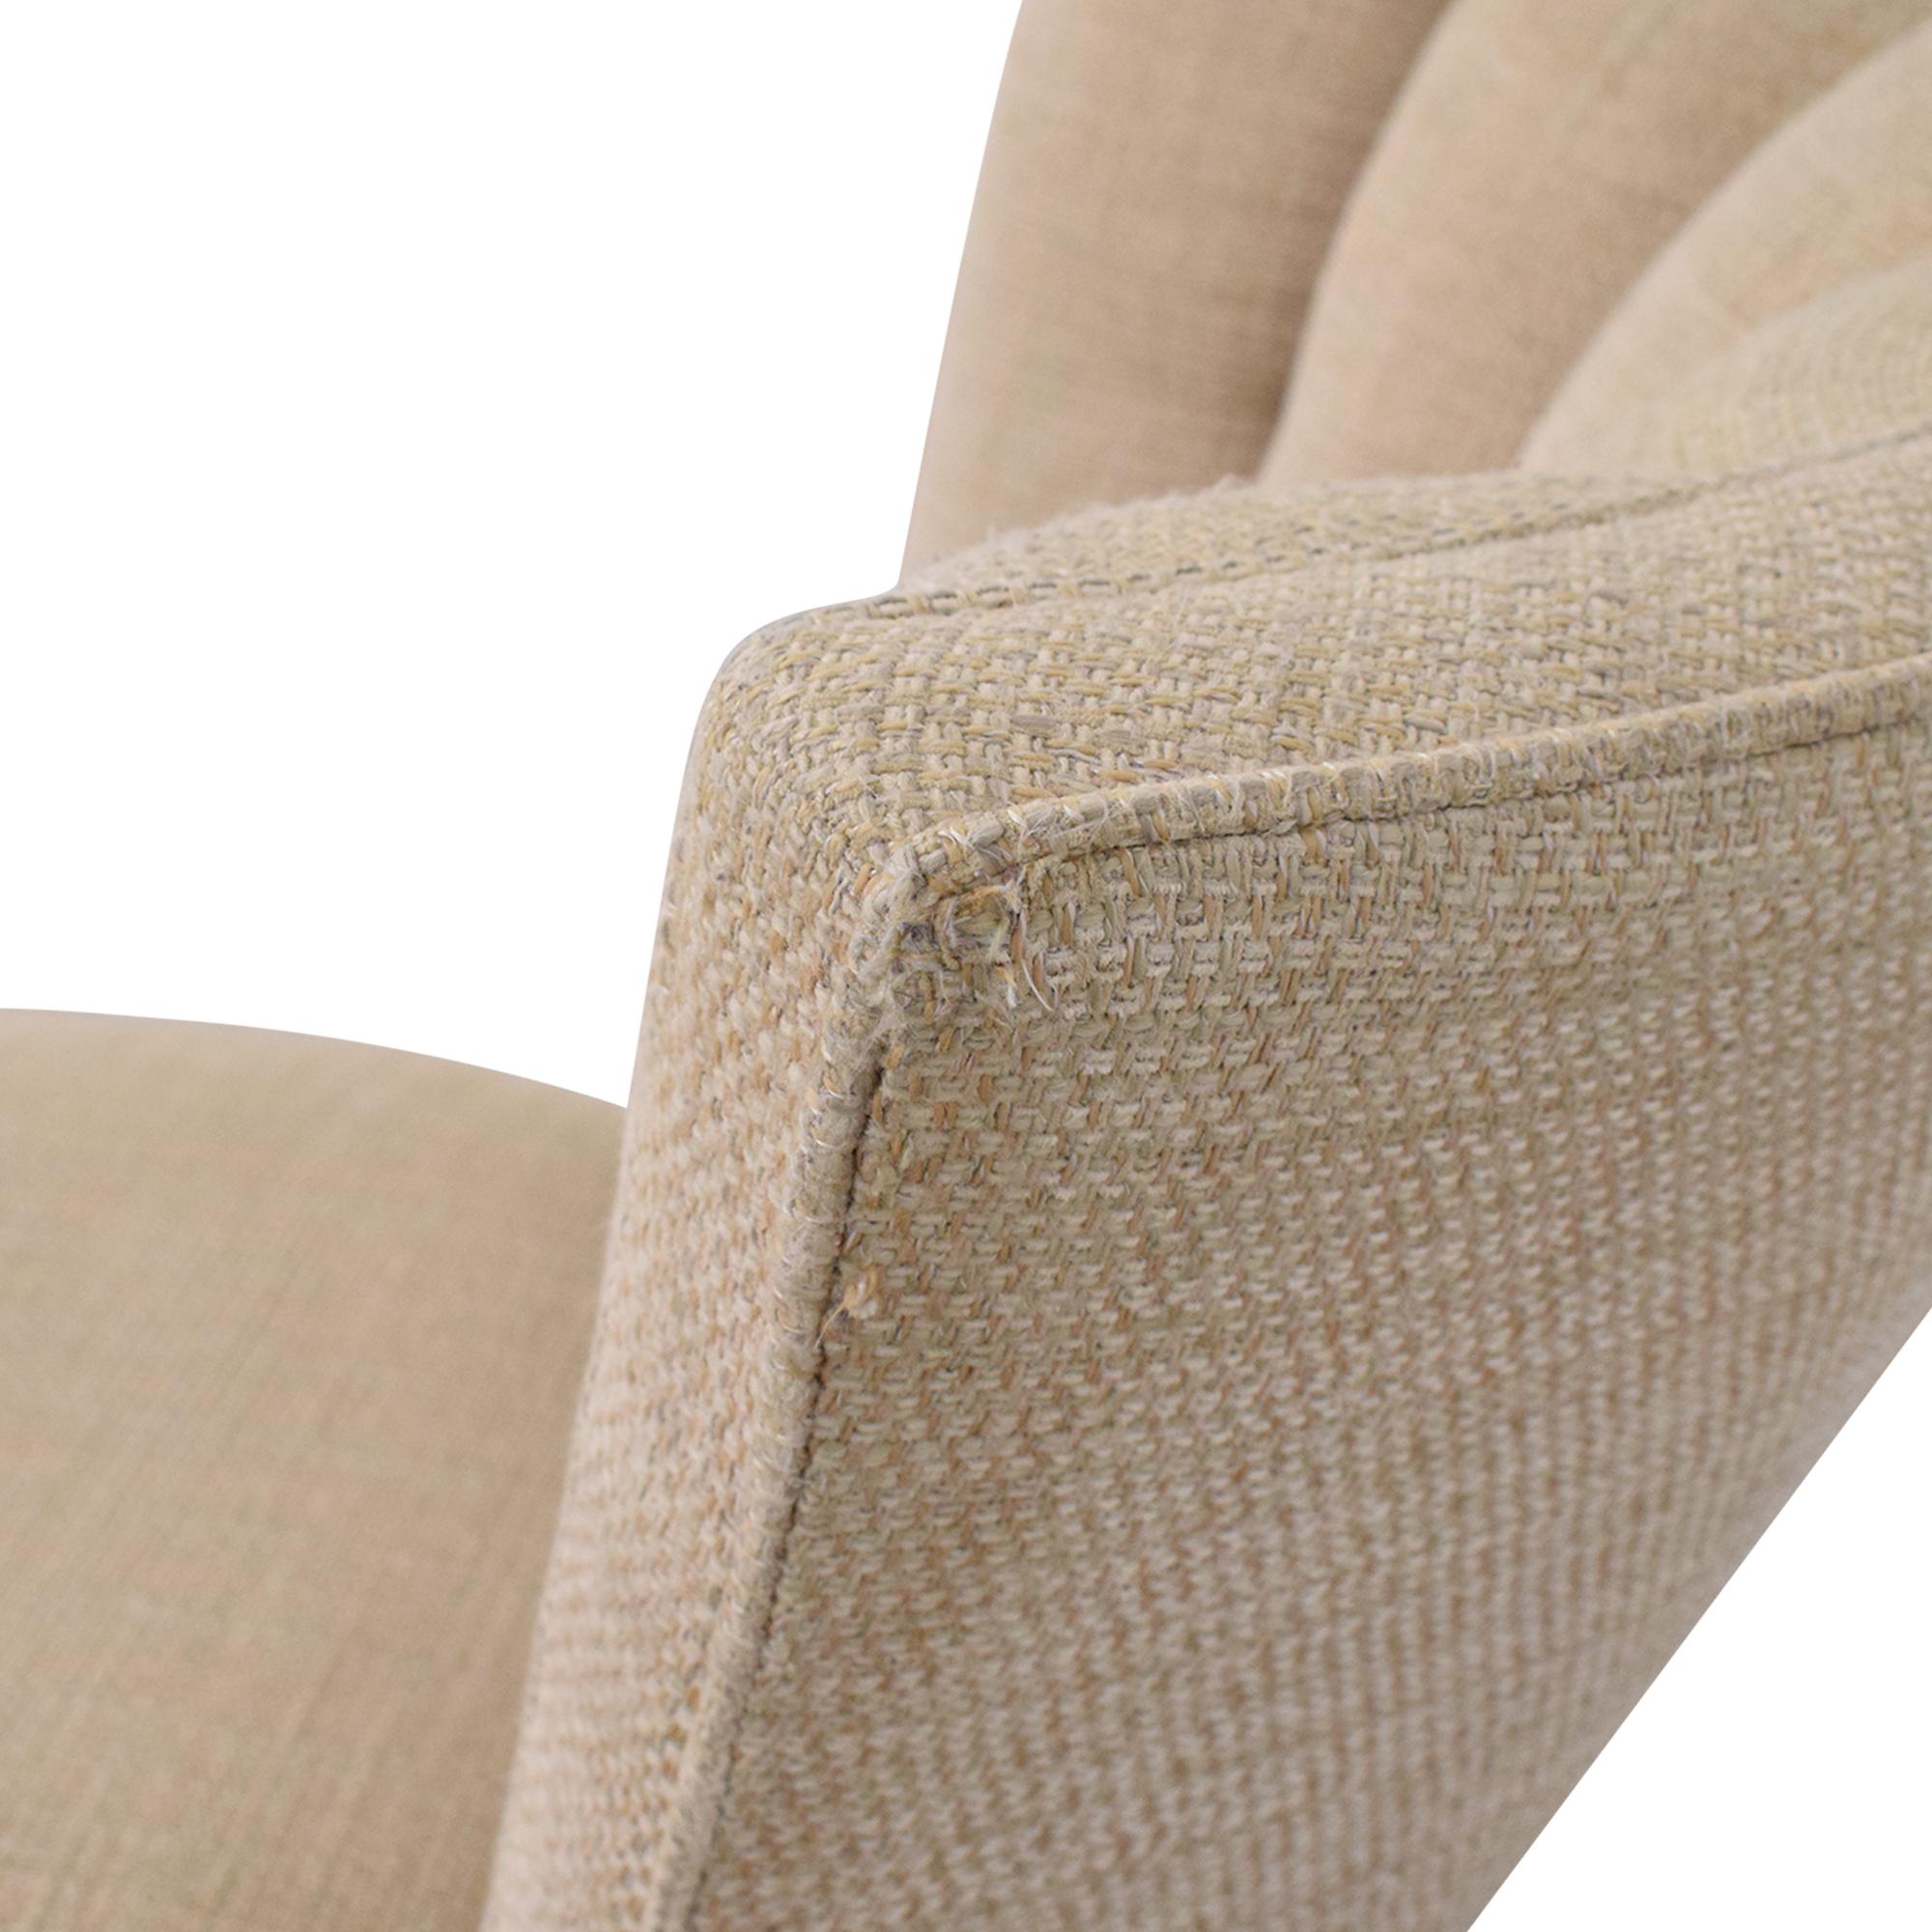 Schnadig Schnadig Ava Chair used